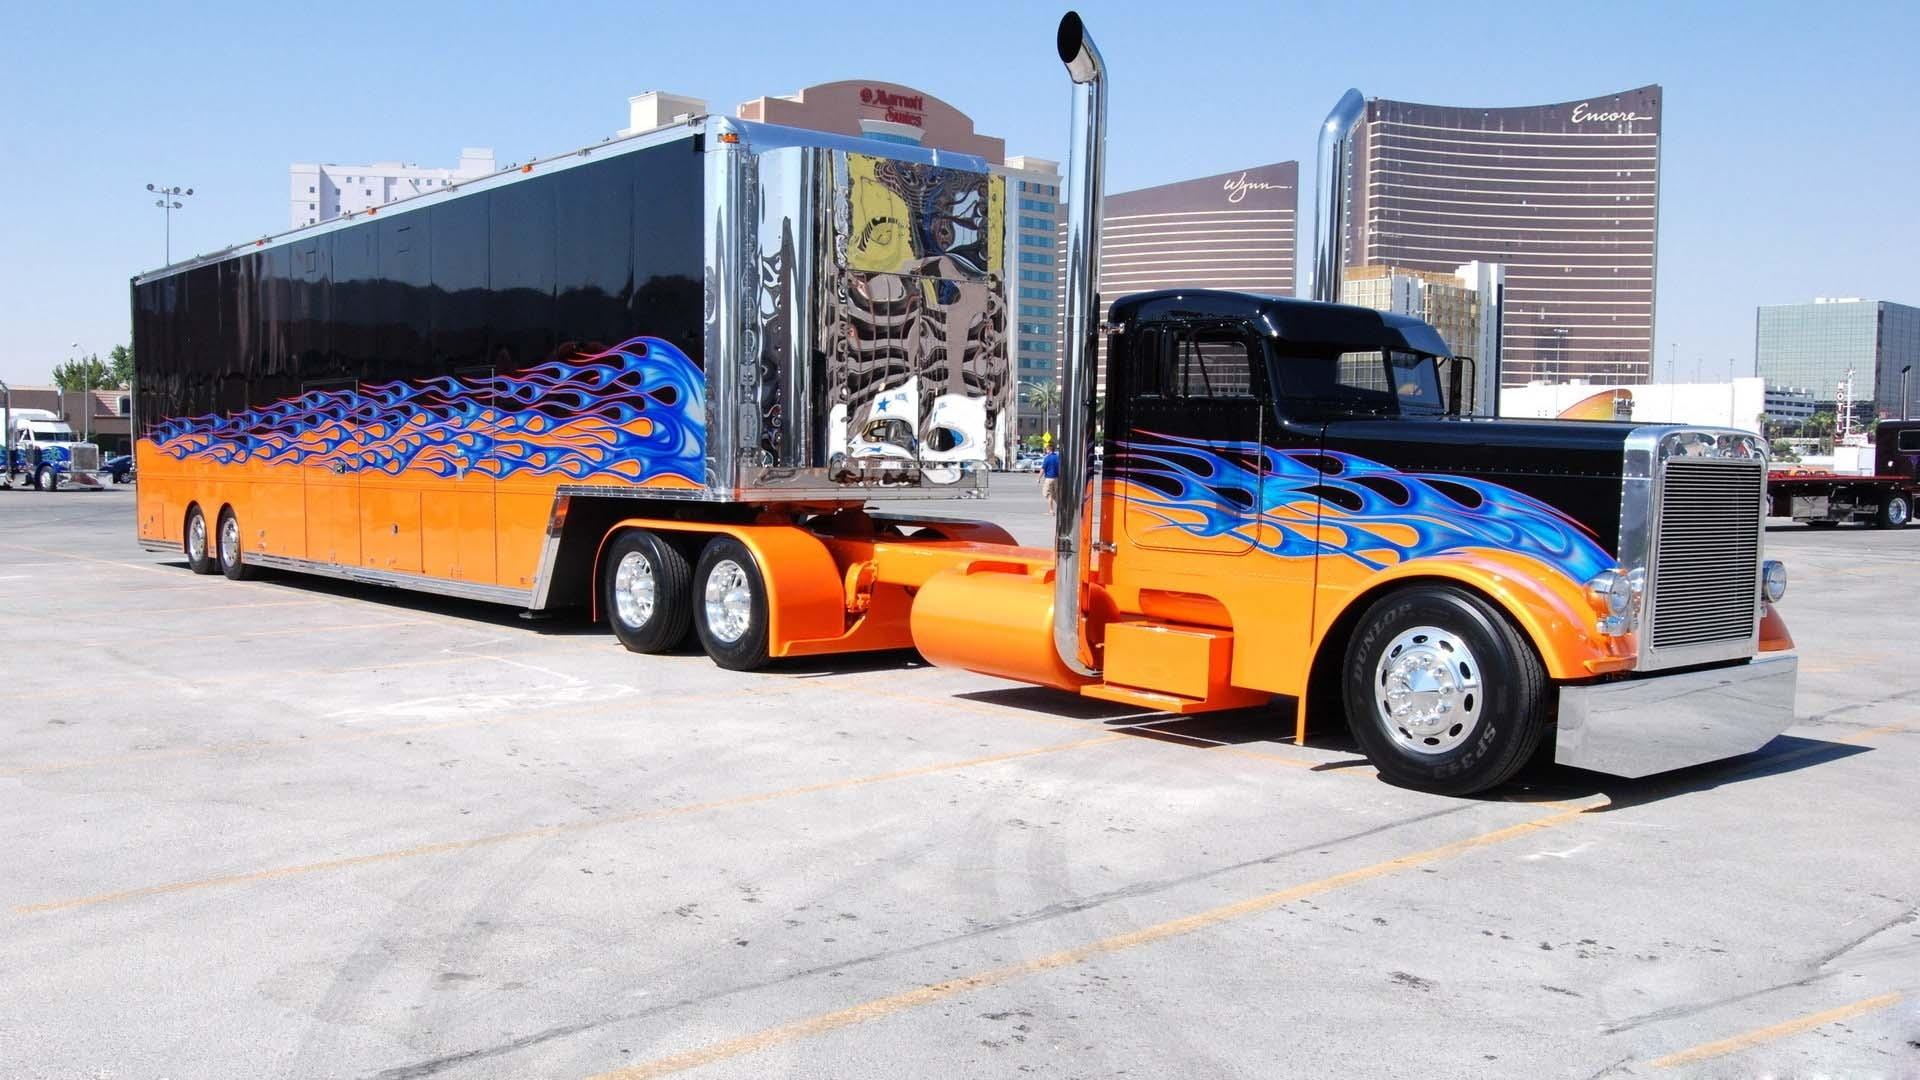 Tunning en camiones - 1920x1080